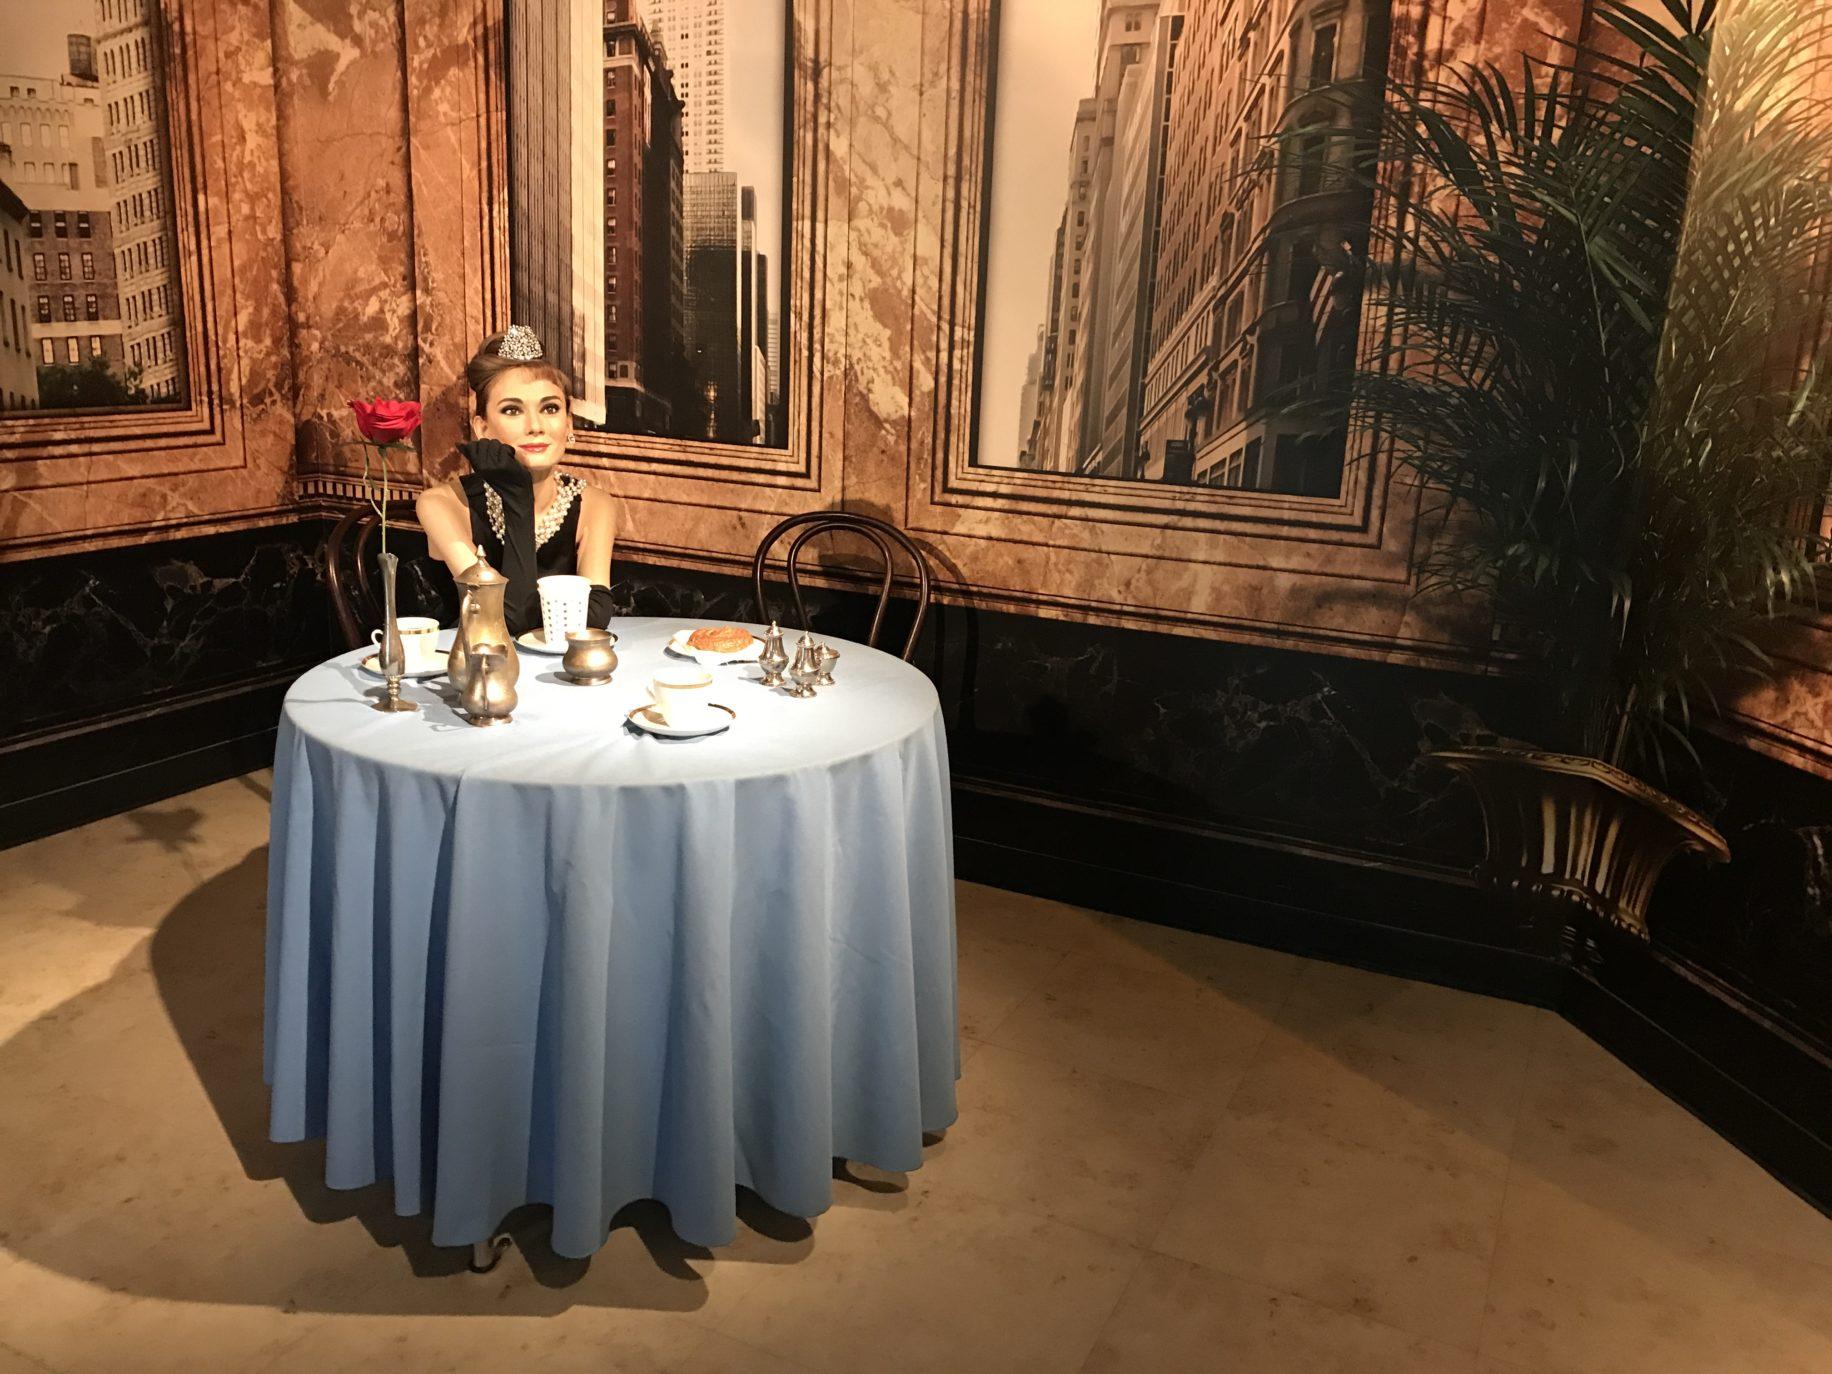 Breakfast at Tiffany's Anyone? \ Image: Dakster Sullivan